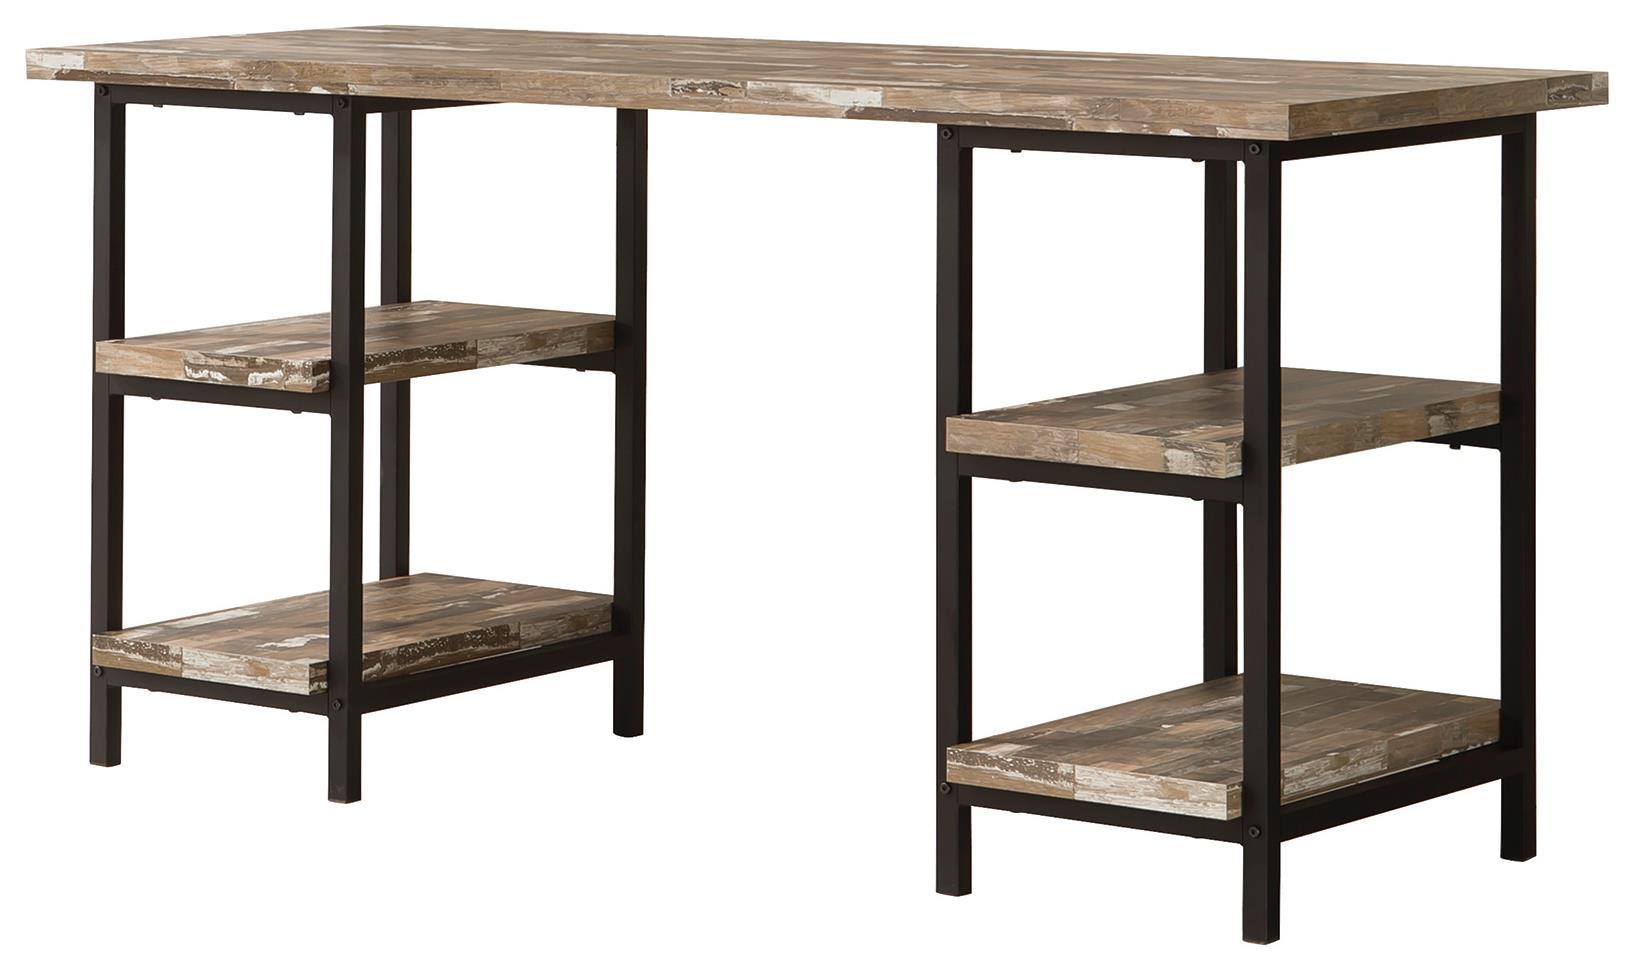 Coaster Skelton 801551 Modern Rustic Writing Desk with